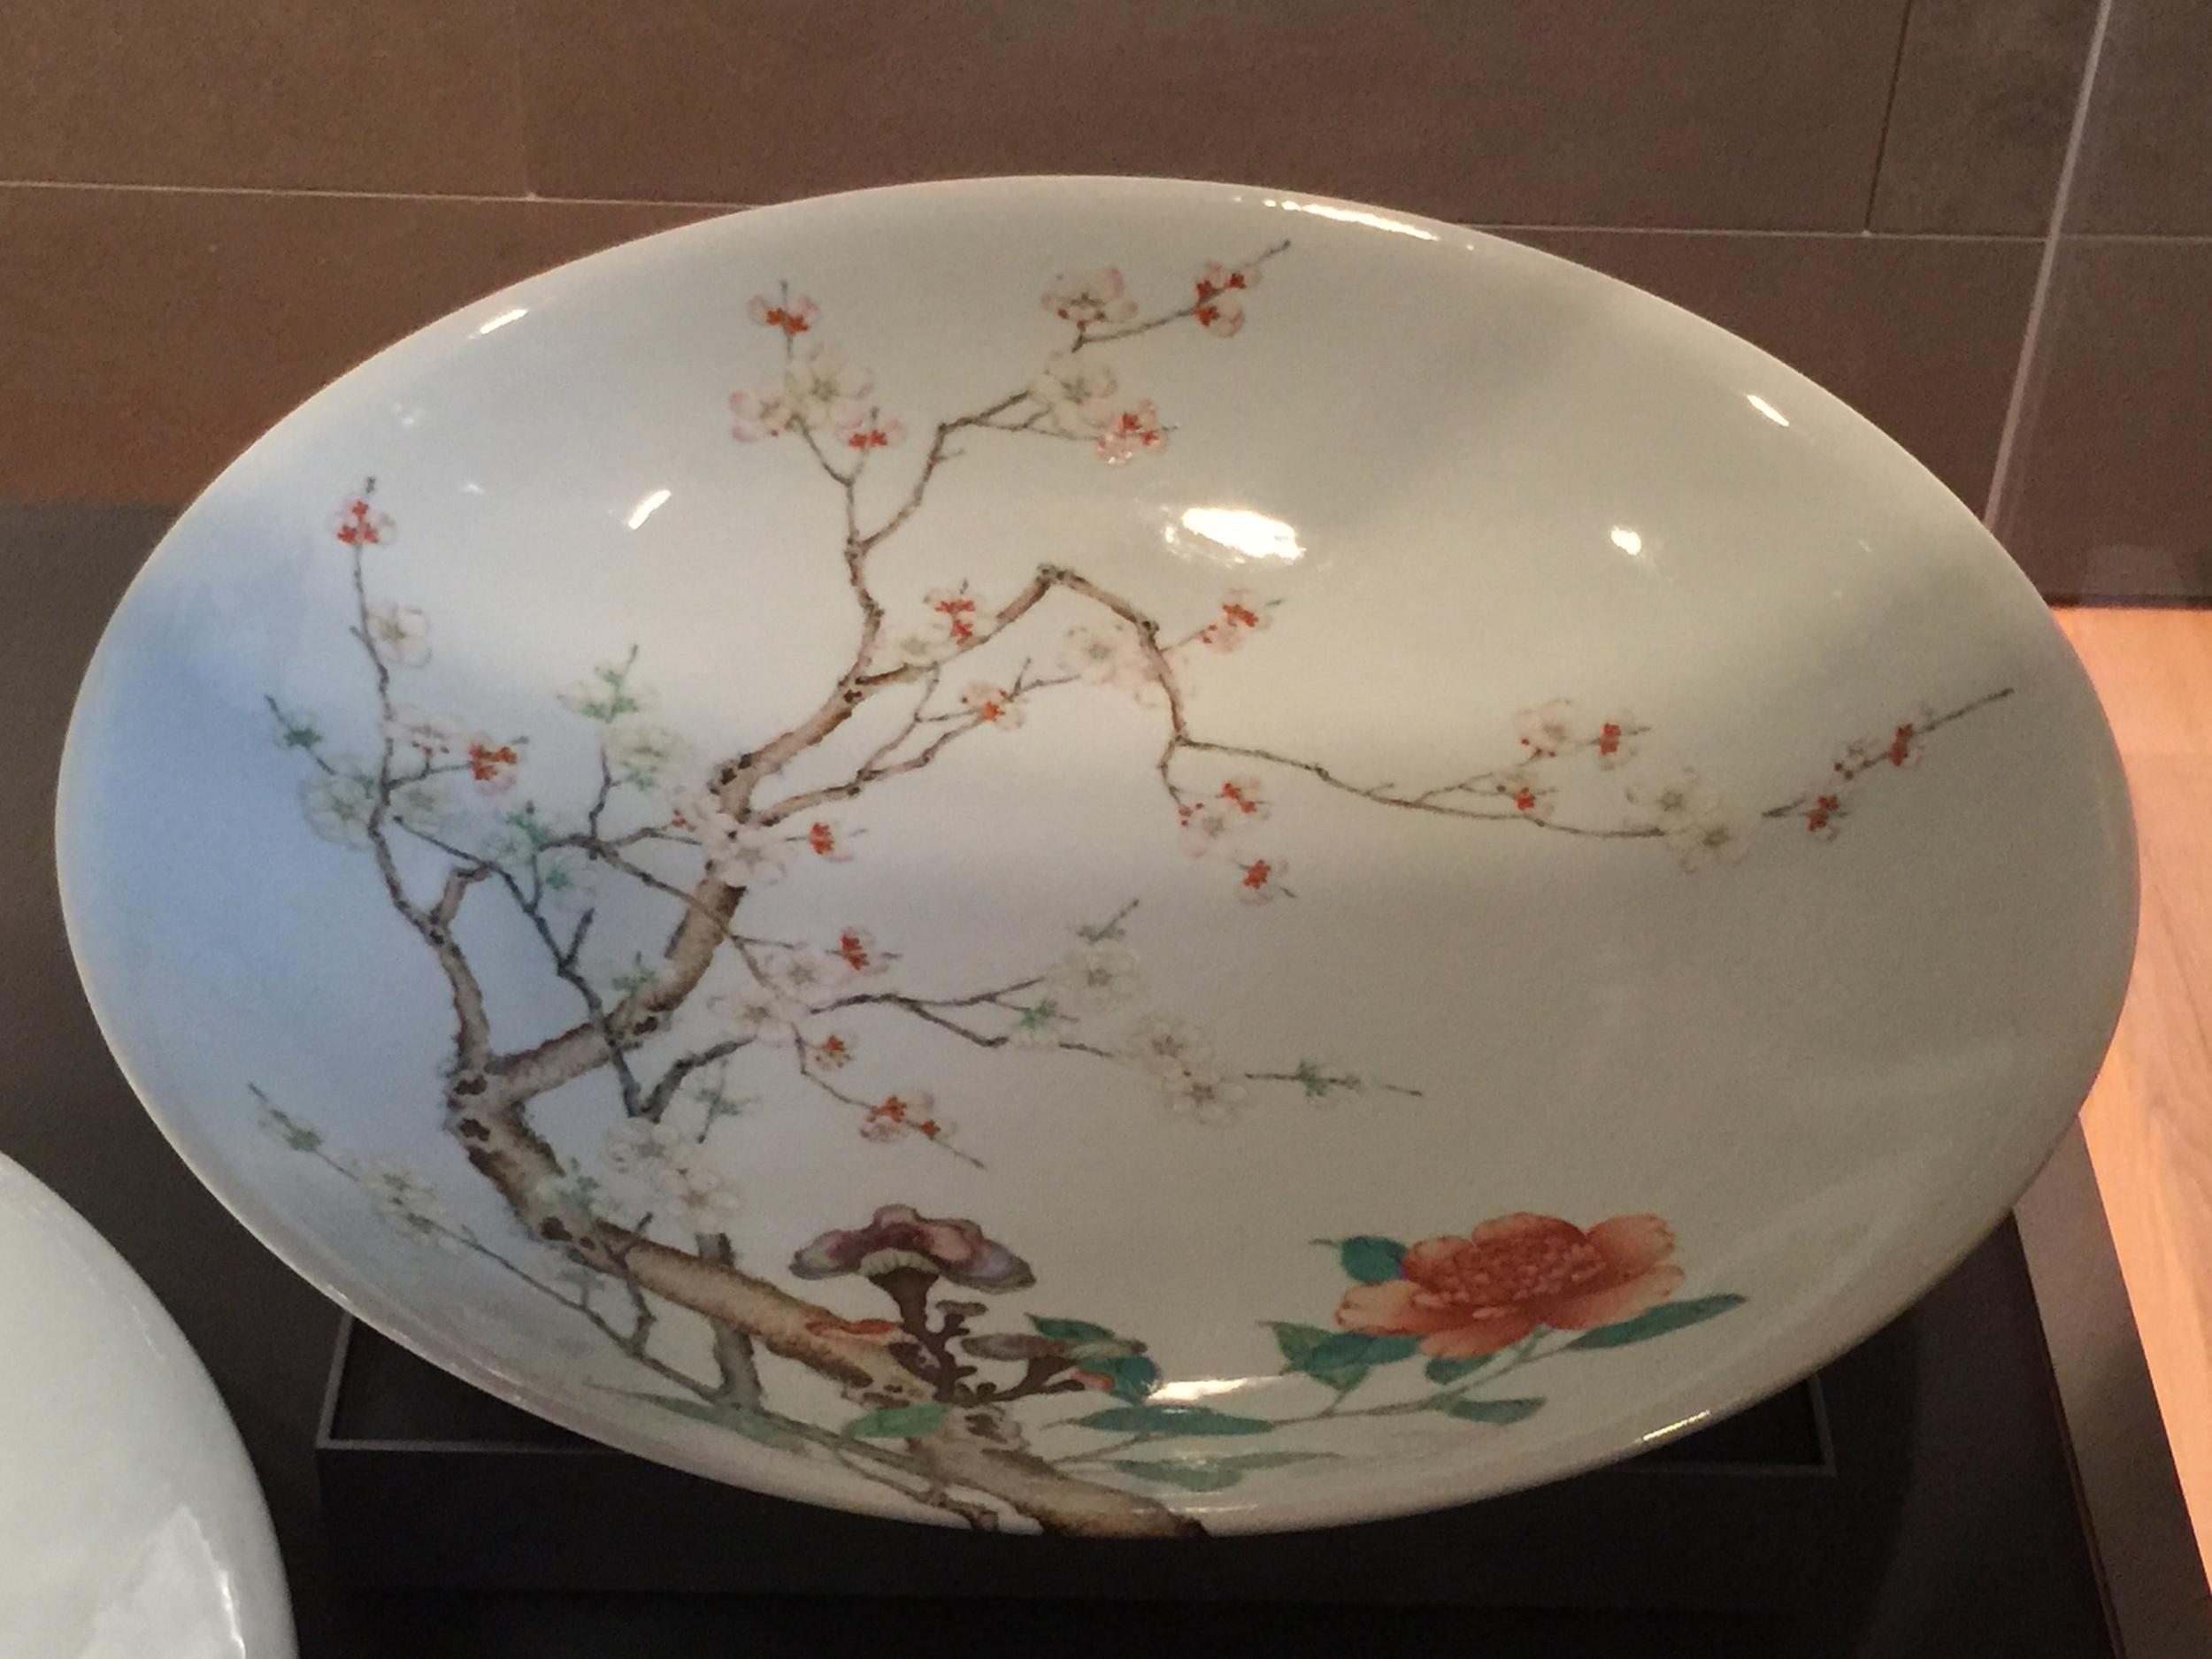 Chinese-Porcelain-British-Museum-Percival-David-jessewaugh.com-82.jpg